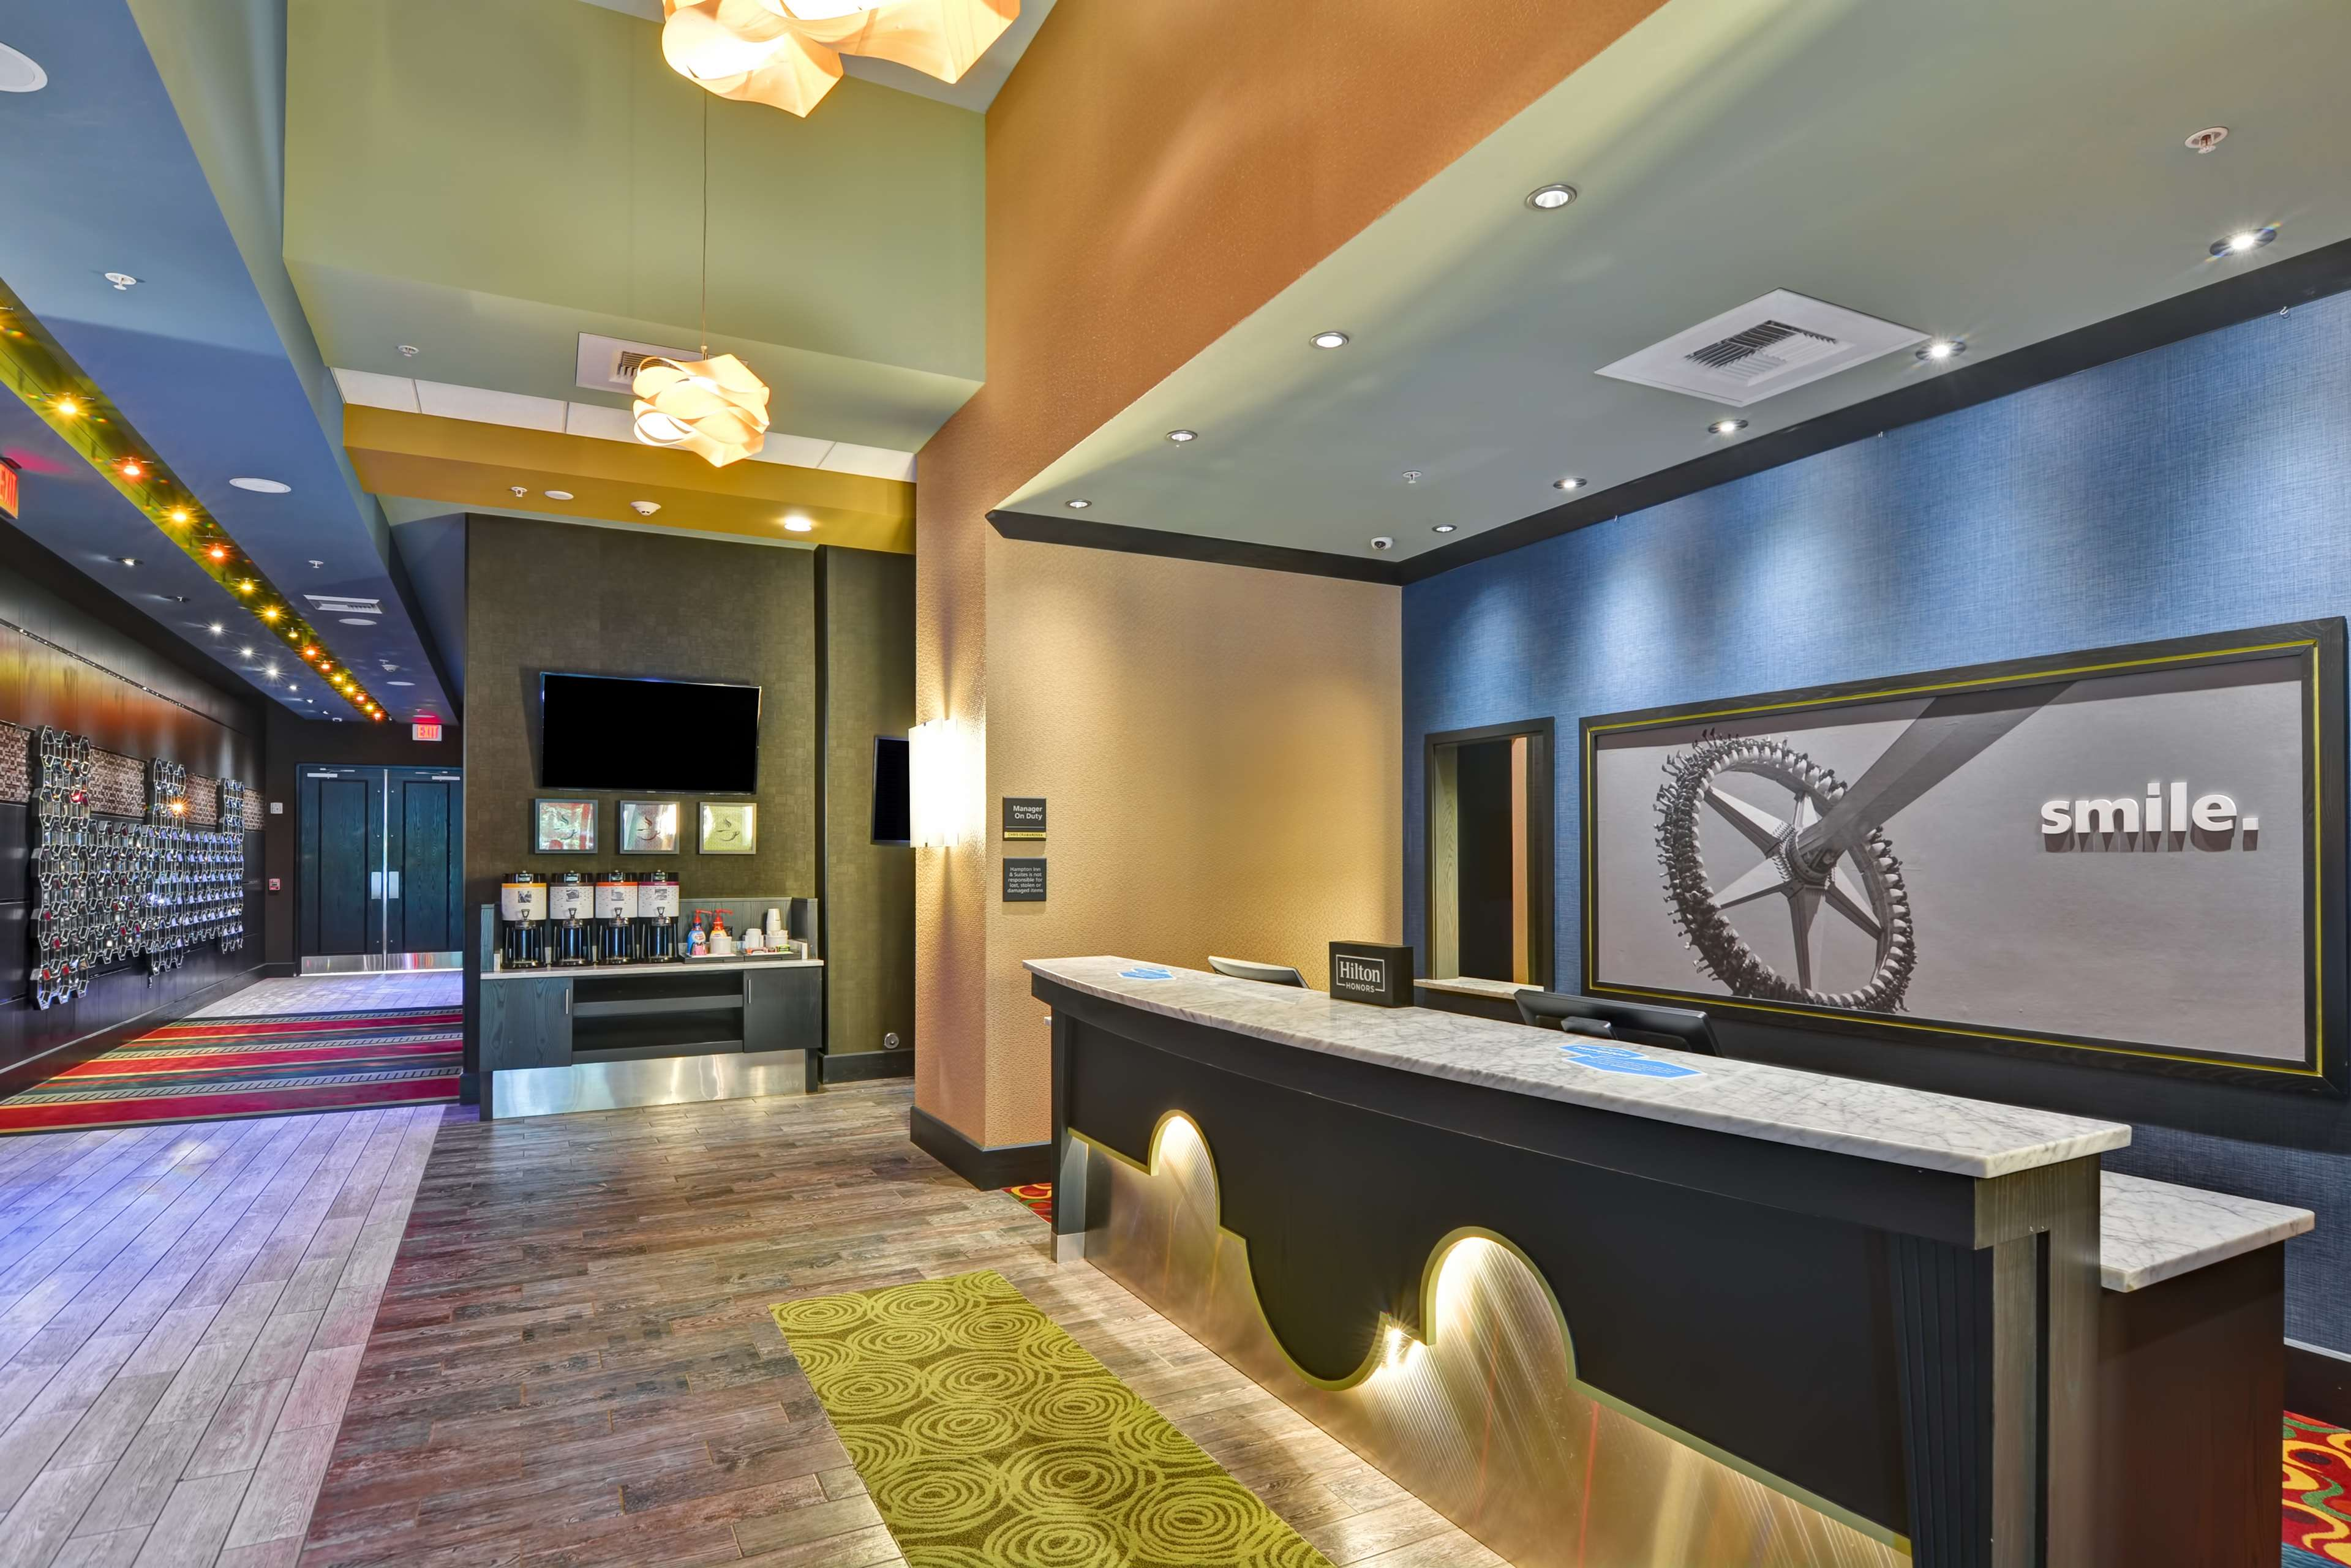 Hampton Inn & Suites Raleigh/Crabtree Valley image 7